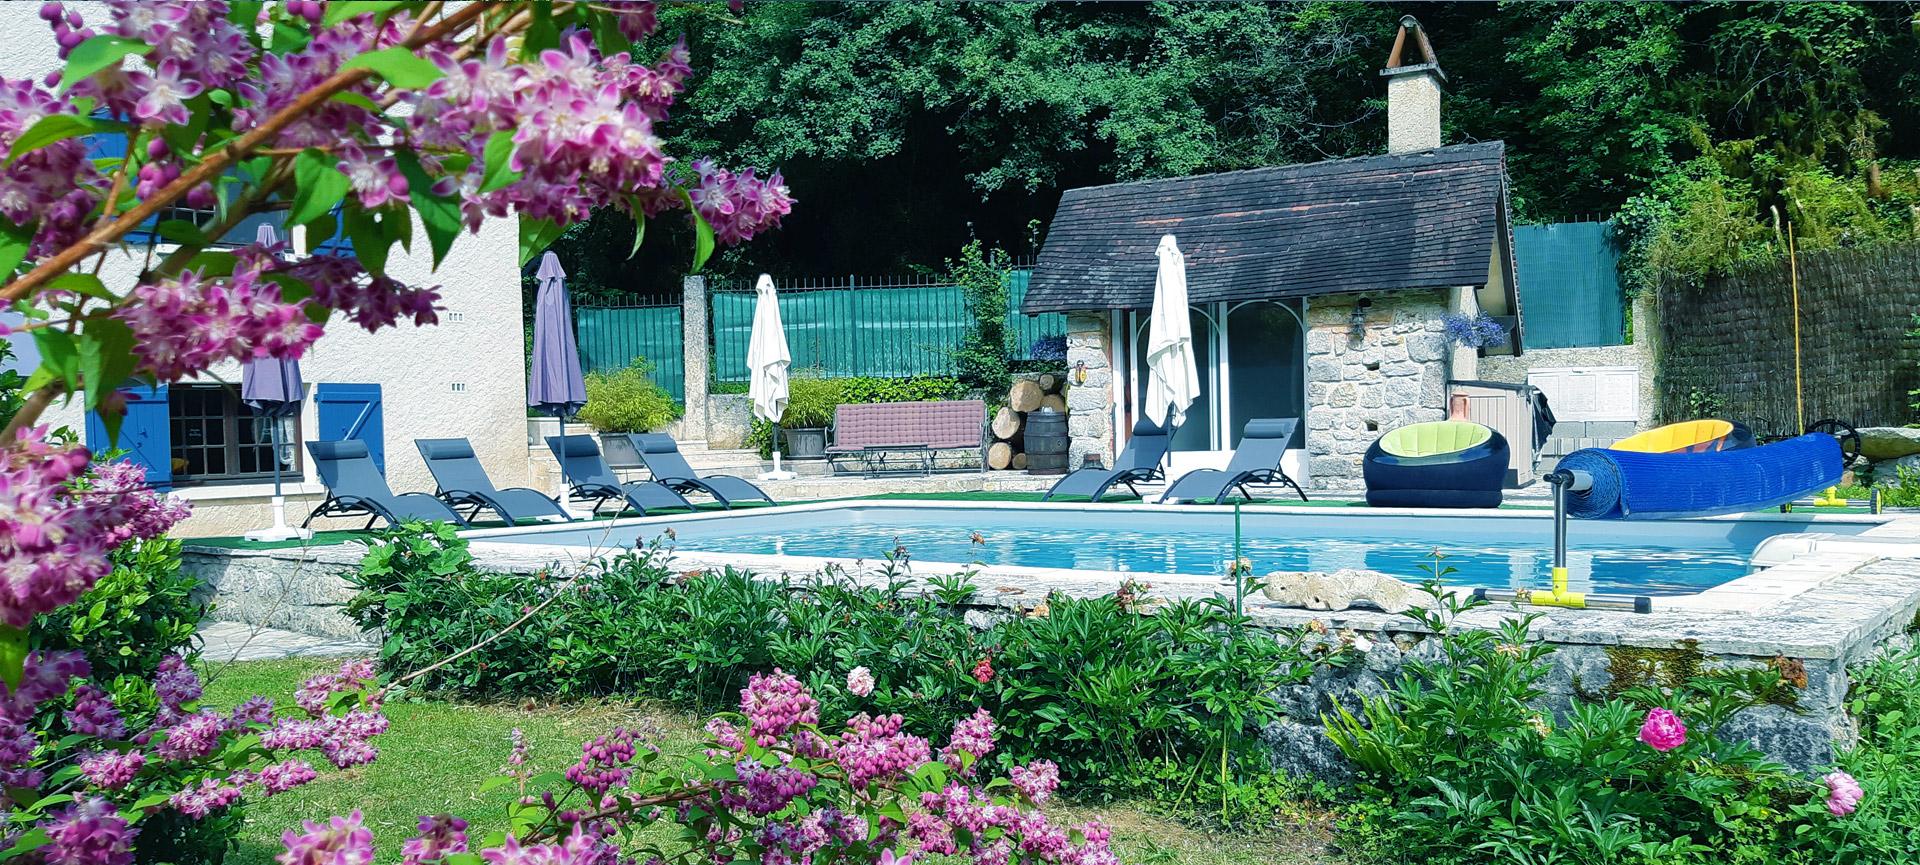 piscine chambres hotes moulin de benedicty figeac 46 rocamadour